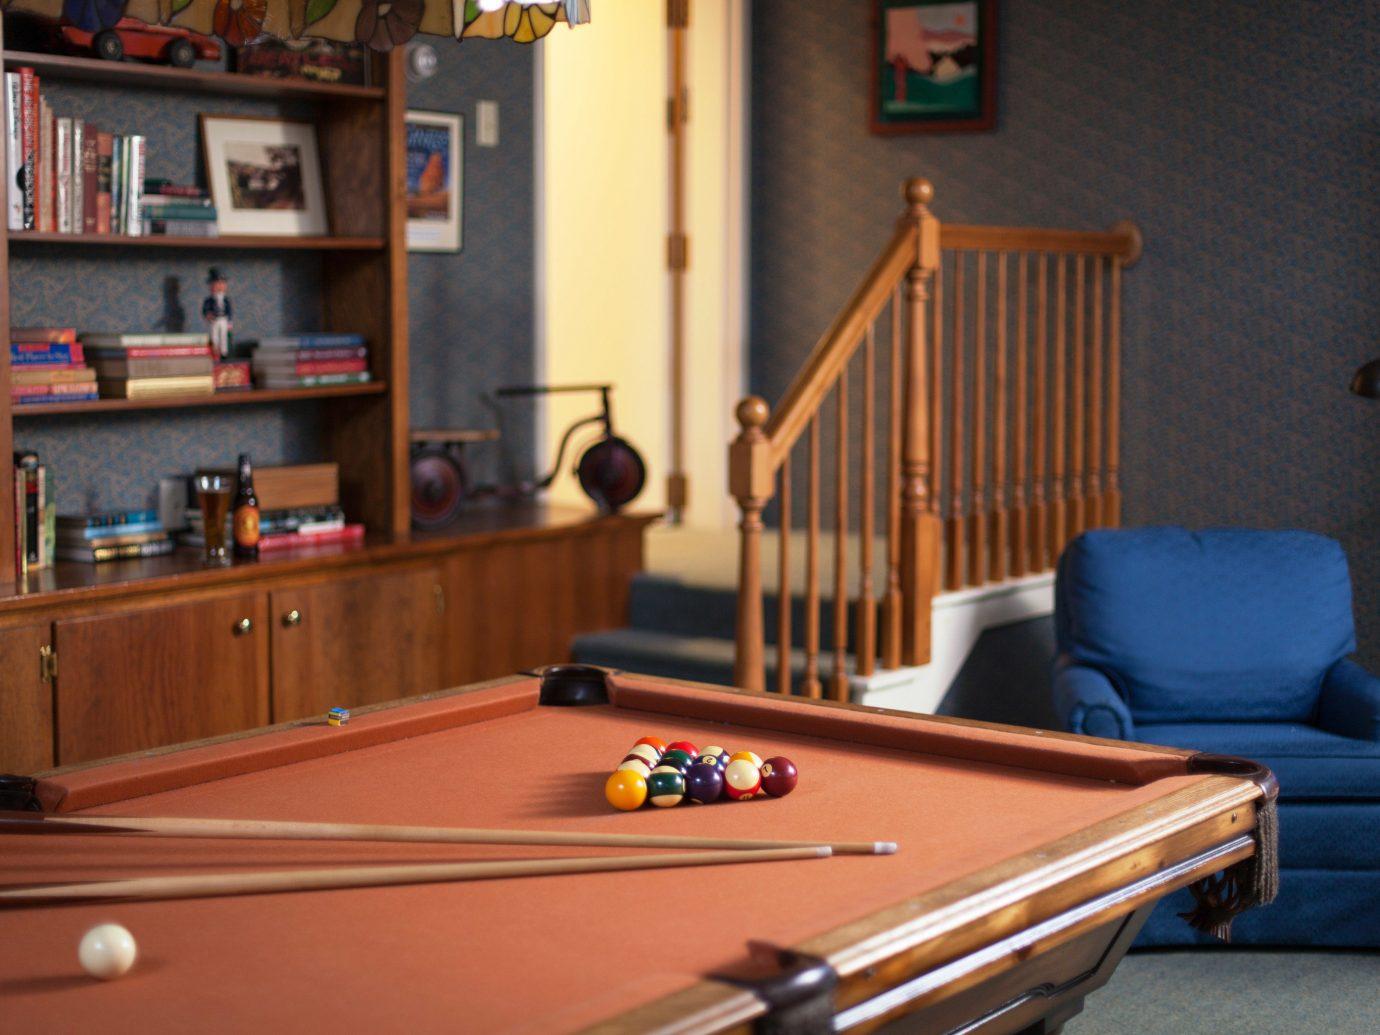 Jetsetter Guides indoor recreation room billiard room carom billiards cue sports floor room Pool shelf Living furniture games poolroom pool table table indoor games and sports billiard table